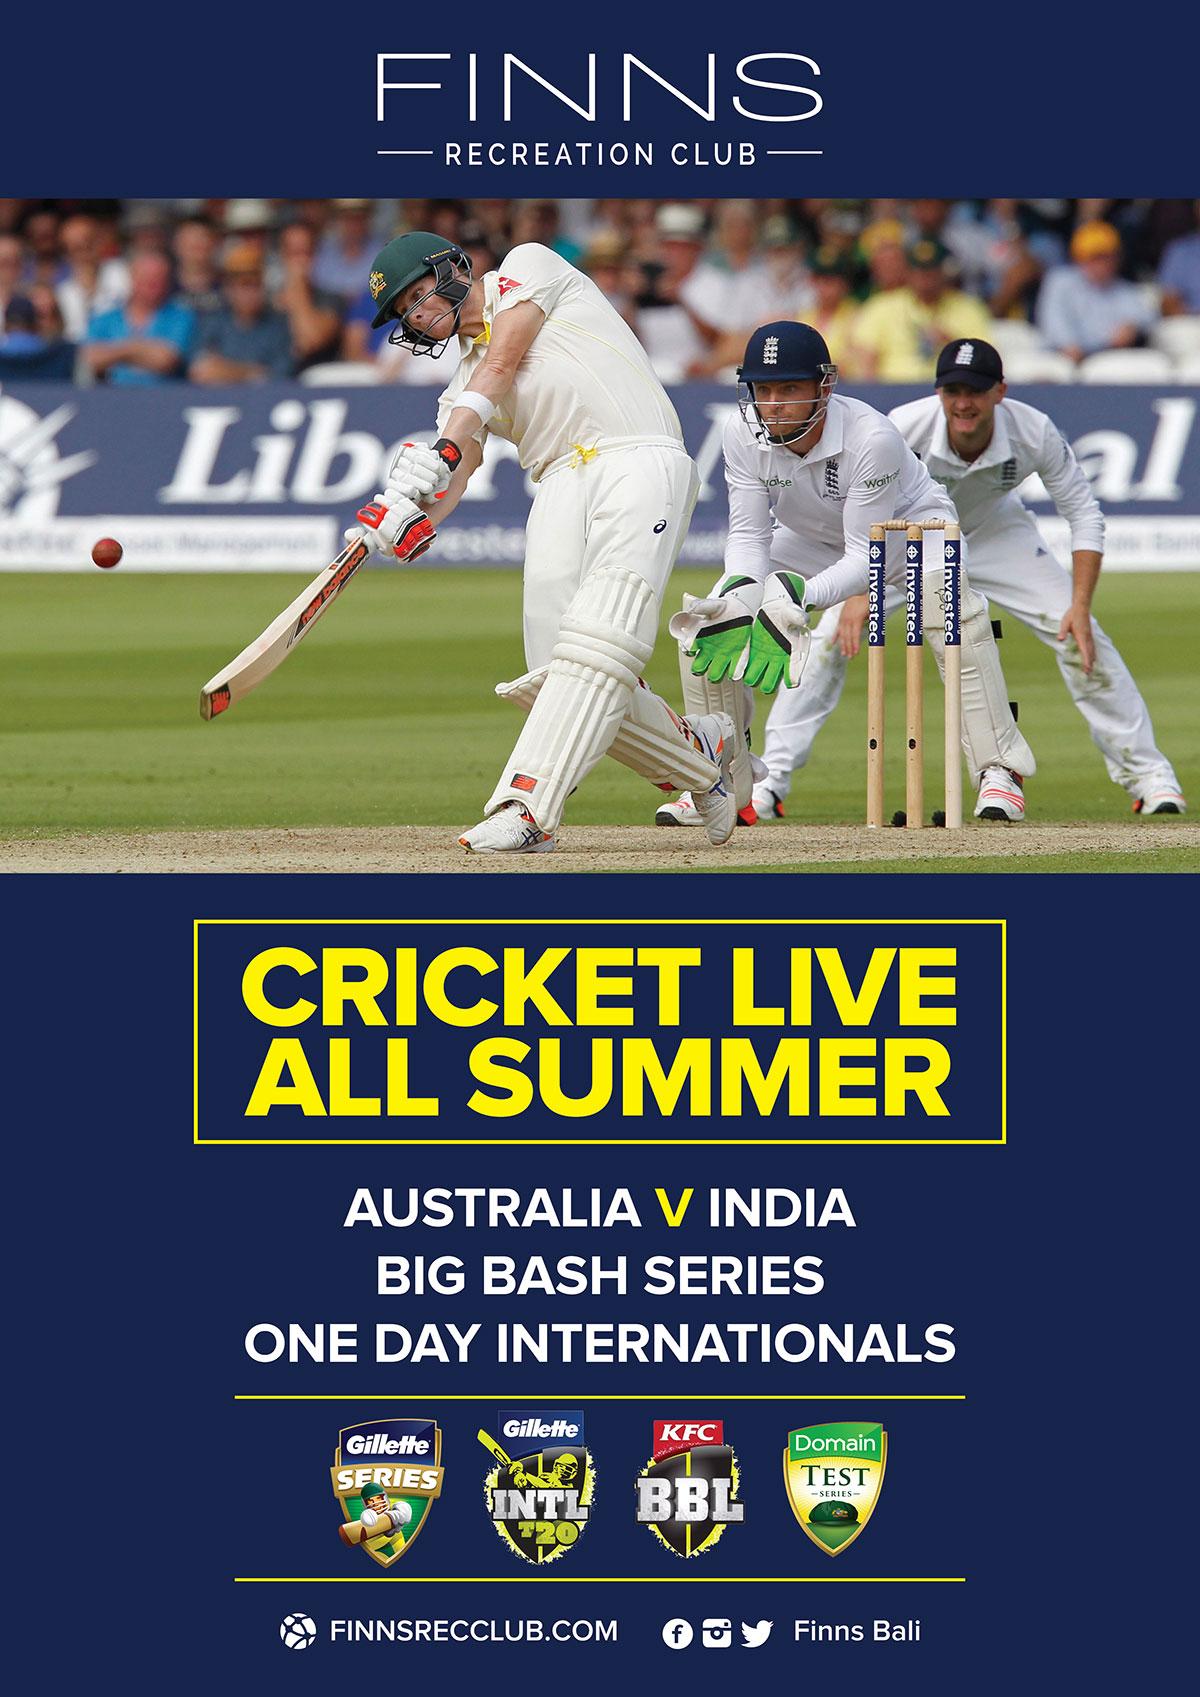 Cricket Live All Summer